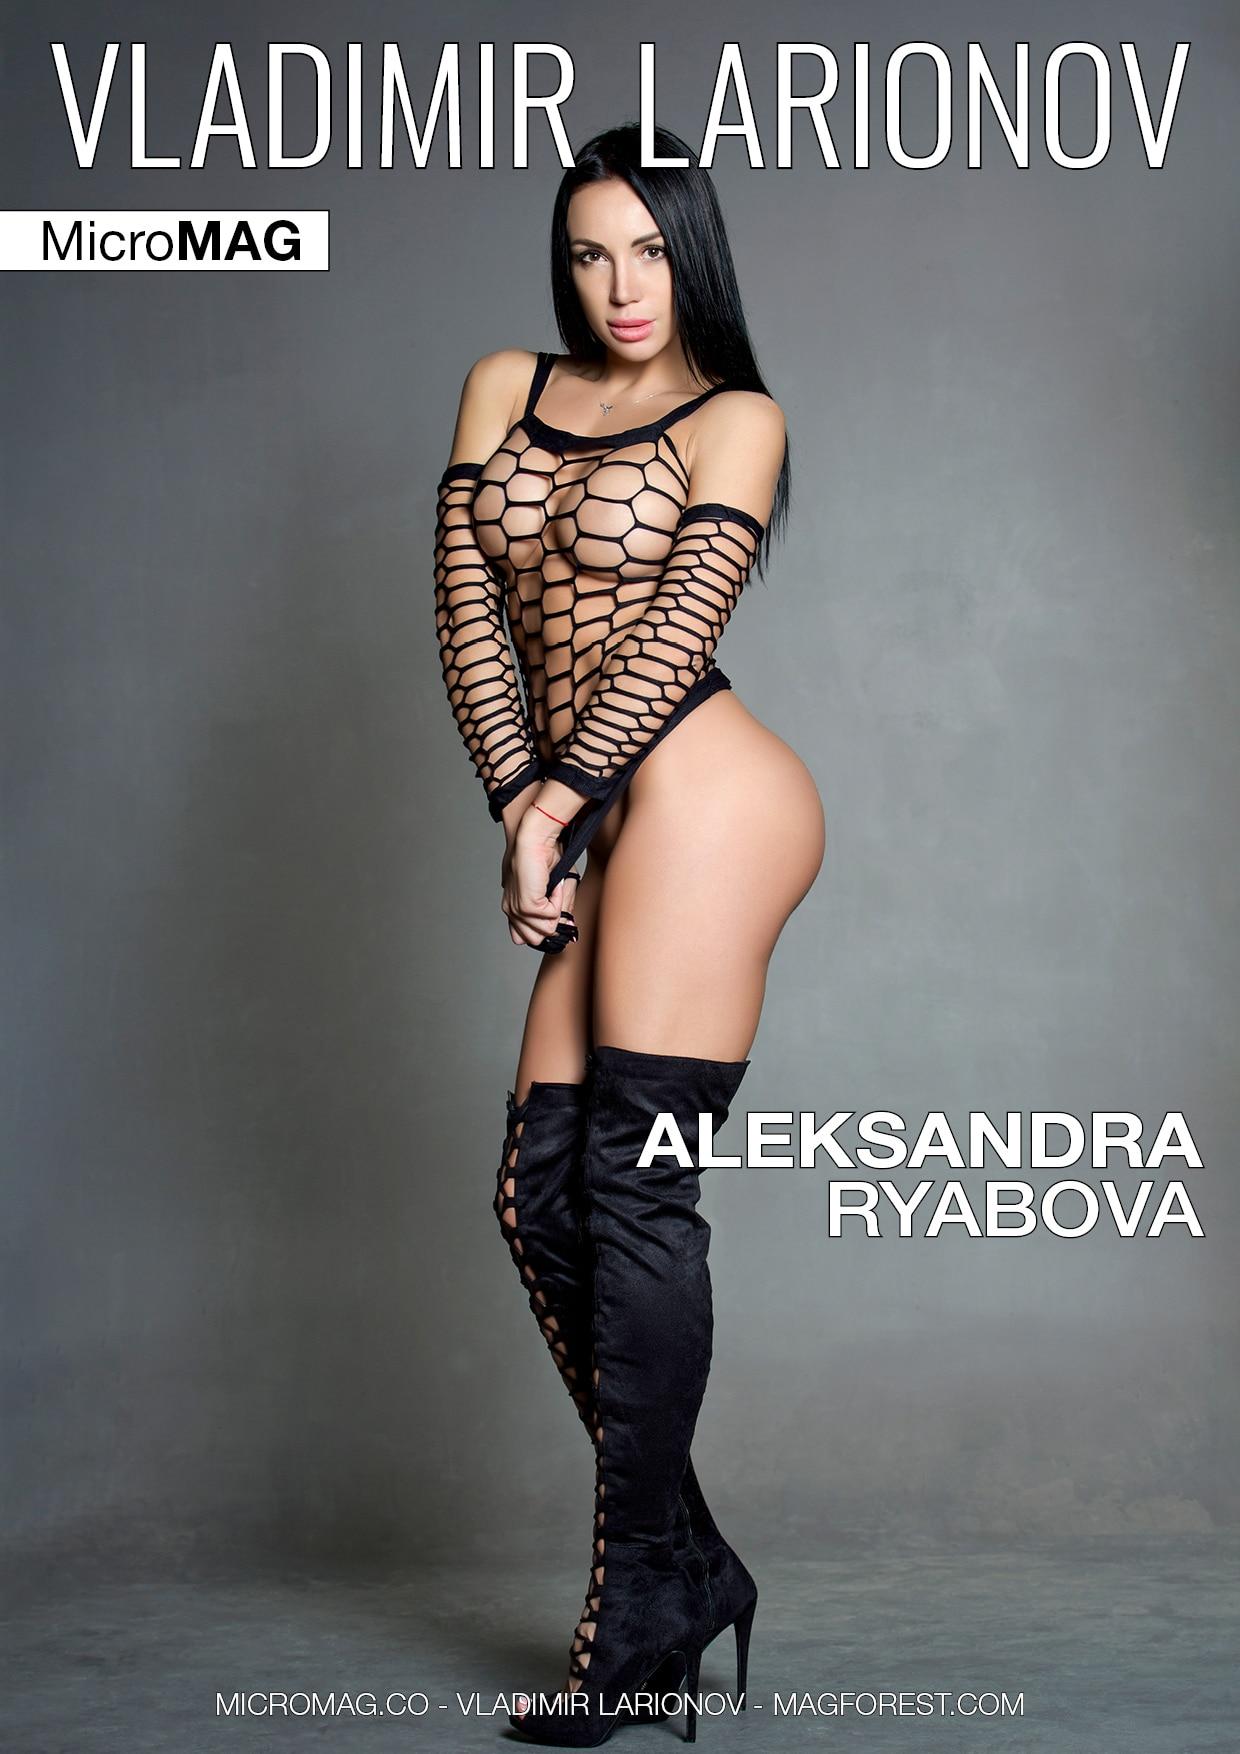 Vladimir Larionov MicroMAG - Aleksandra Ryabova - Issue 2 1